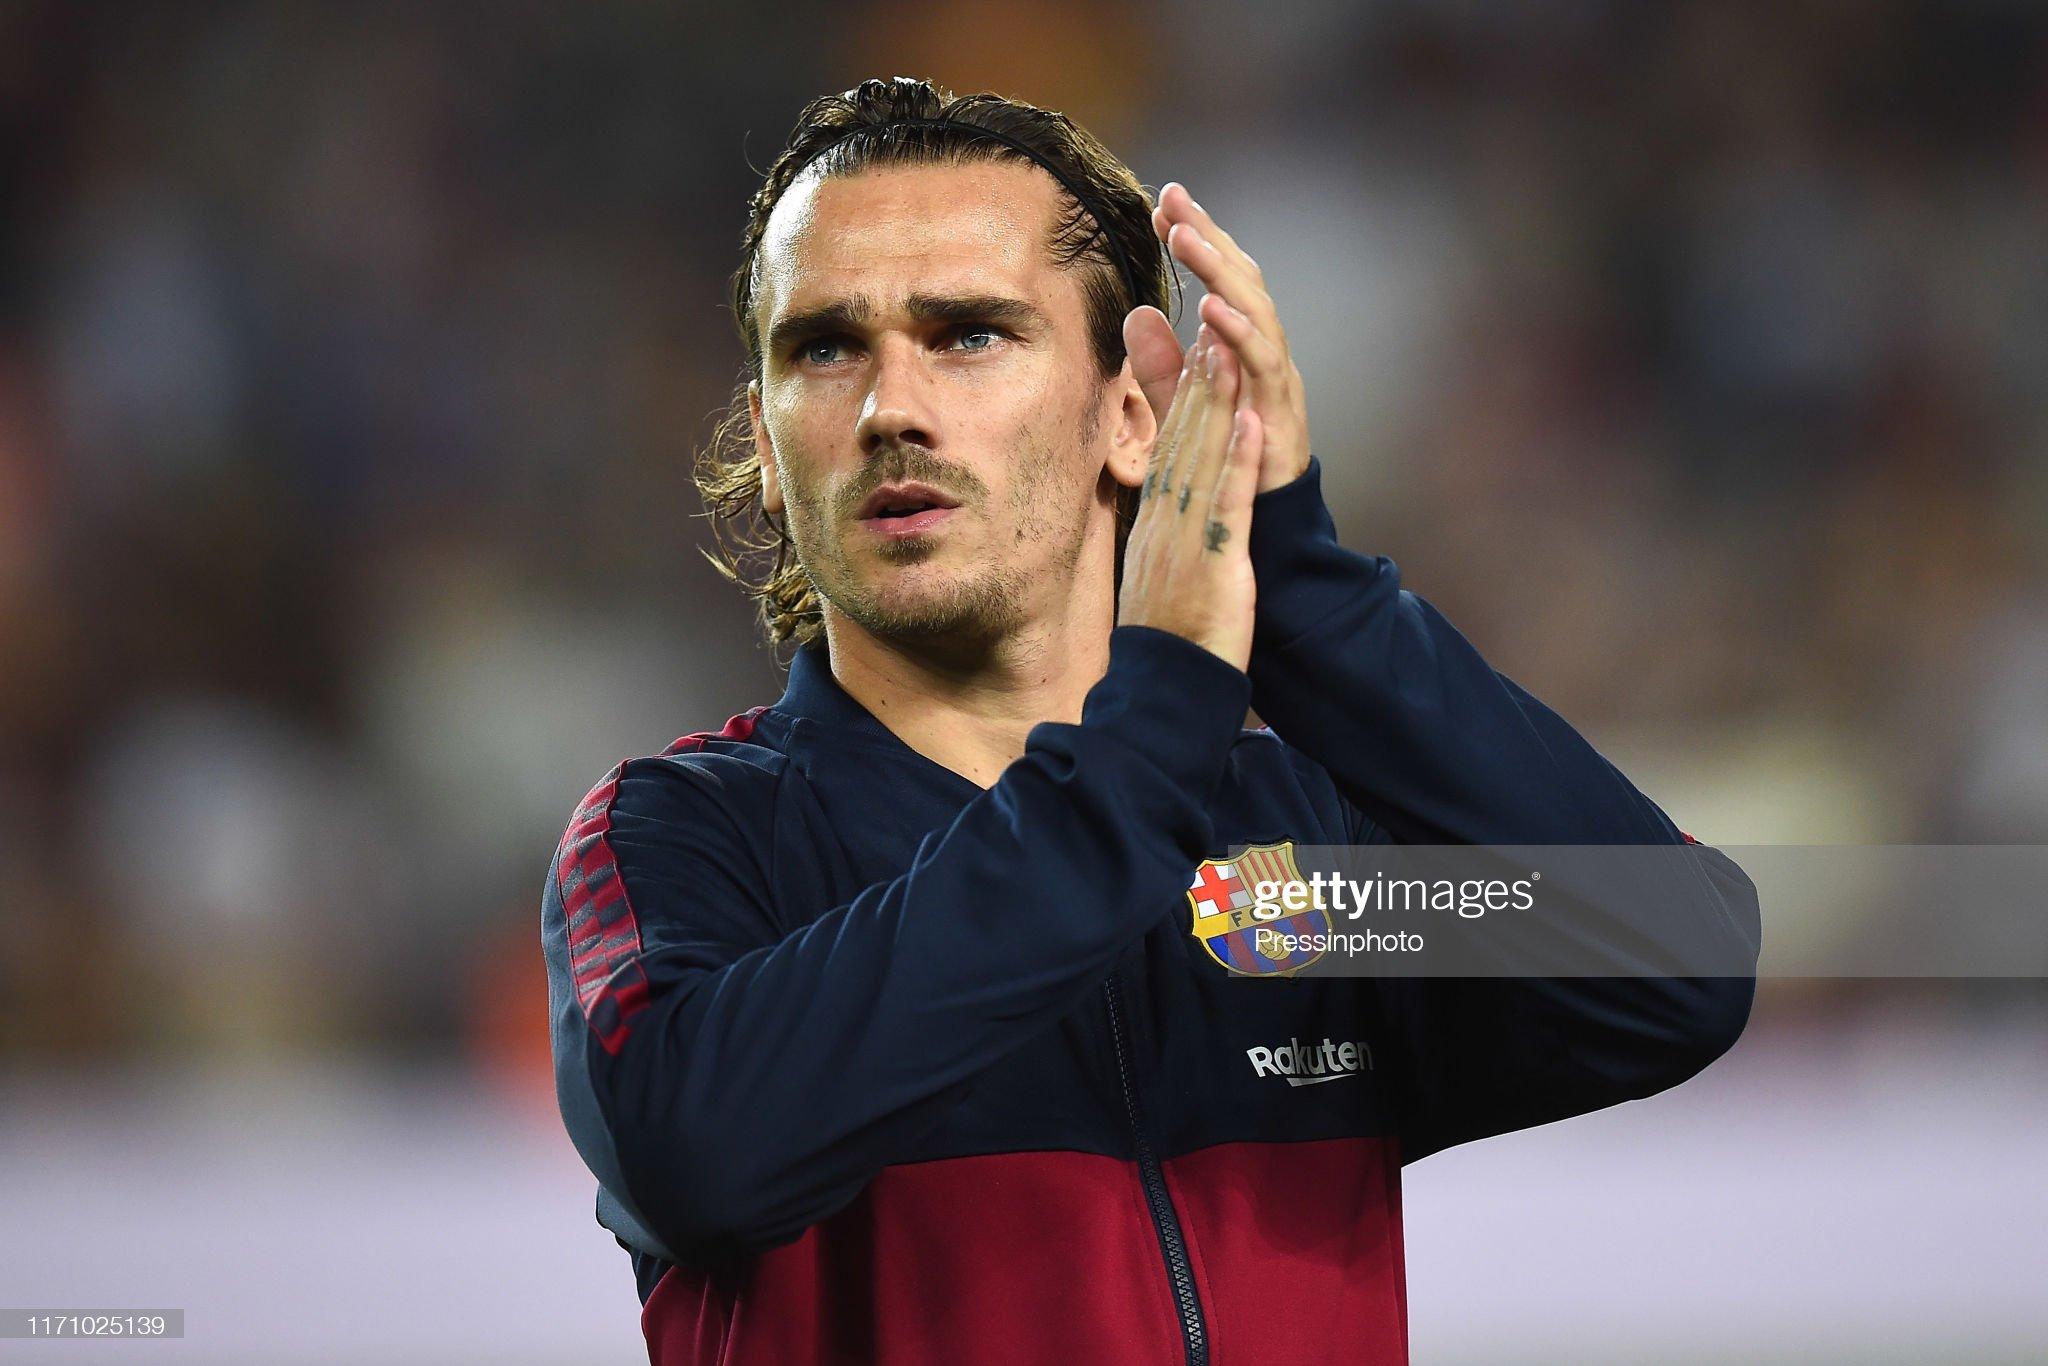 صور مباراة : برشلونة - فياريال 2-1 ( 24-09-2019 )  Antoine-griezmann-of-fc-barcelona-during-the-liga-match-between-and-picture-id1171025139?s=2048x2048